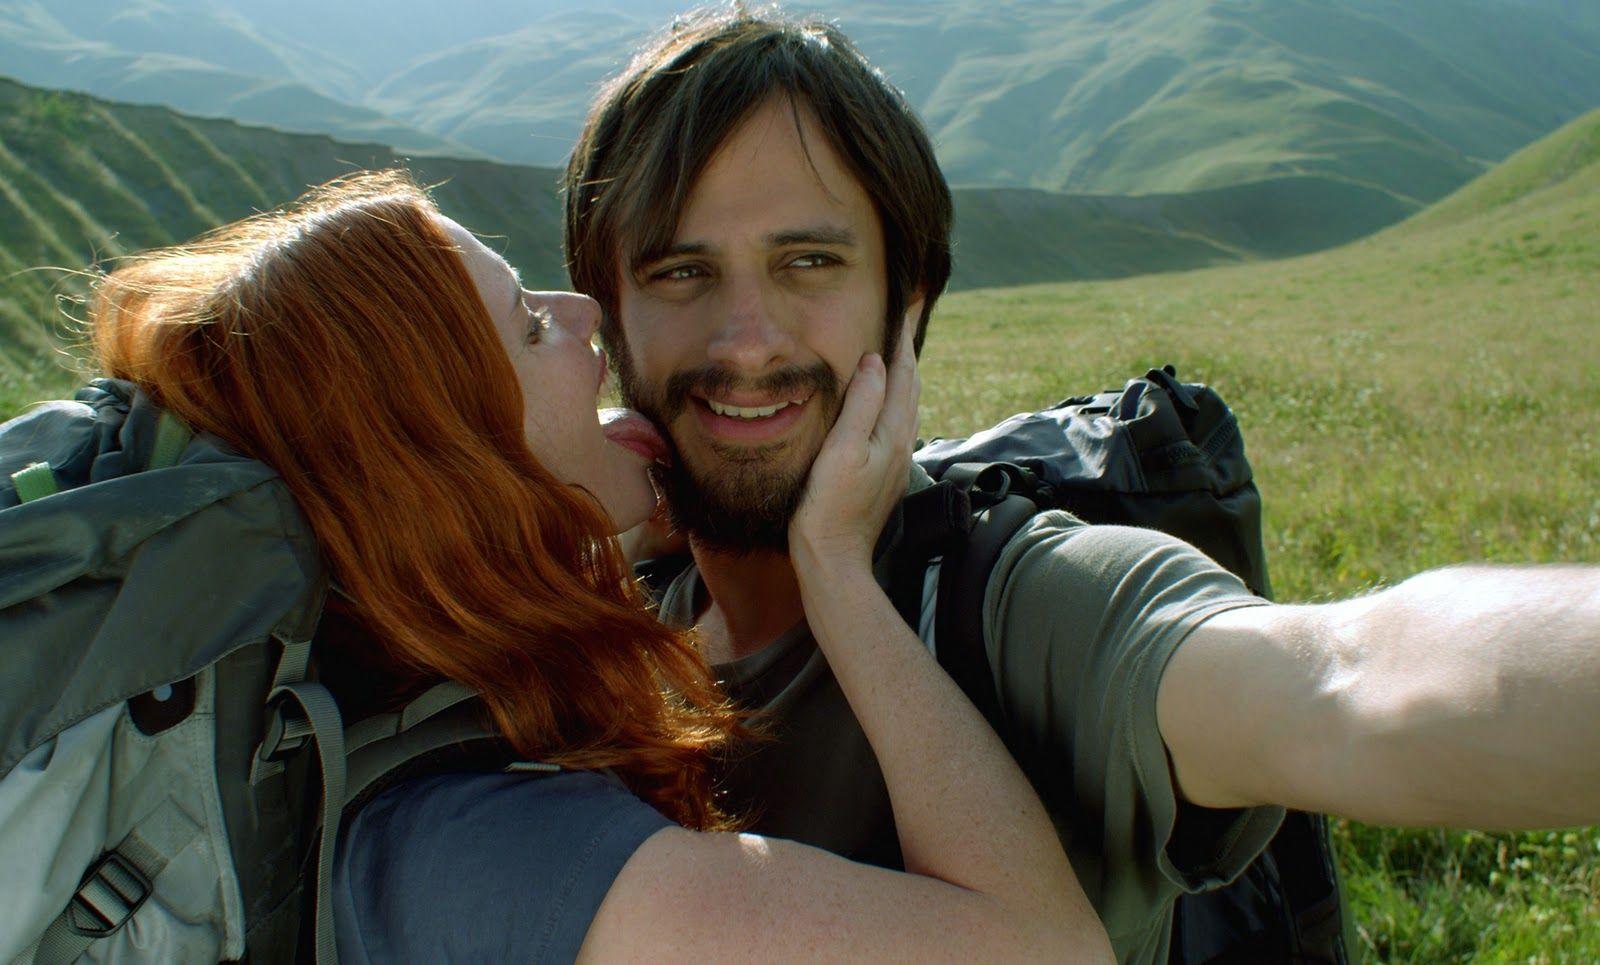 Gael Garcia Bernal Filmes for the loneliest planet trailer featuring gael garcia bernal | collider